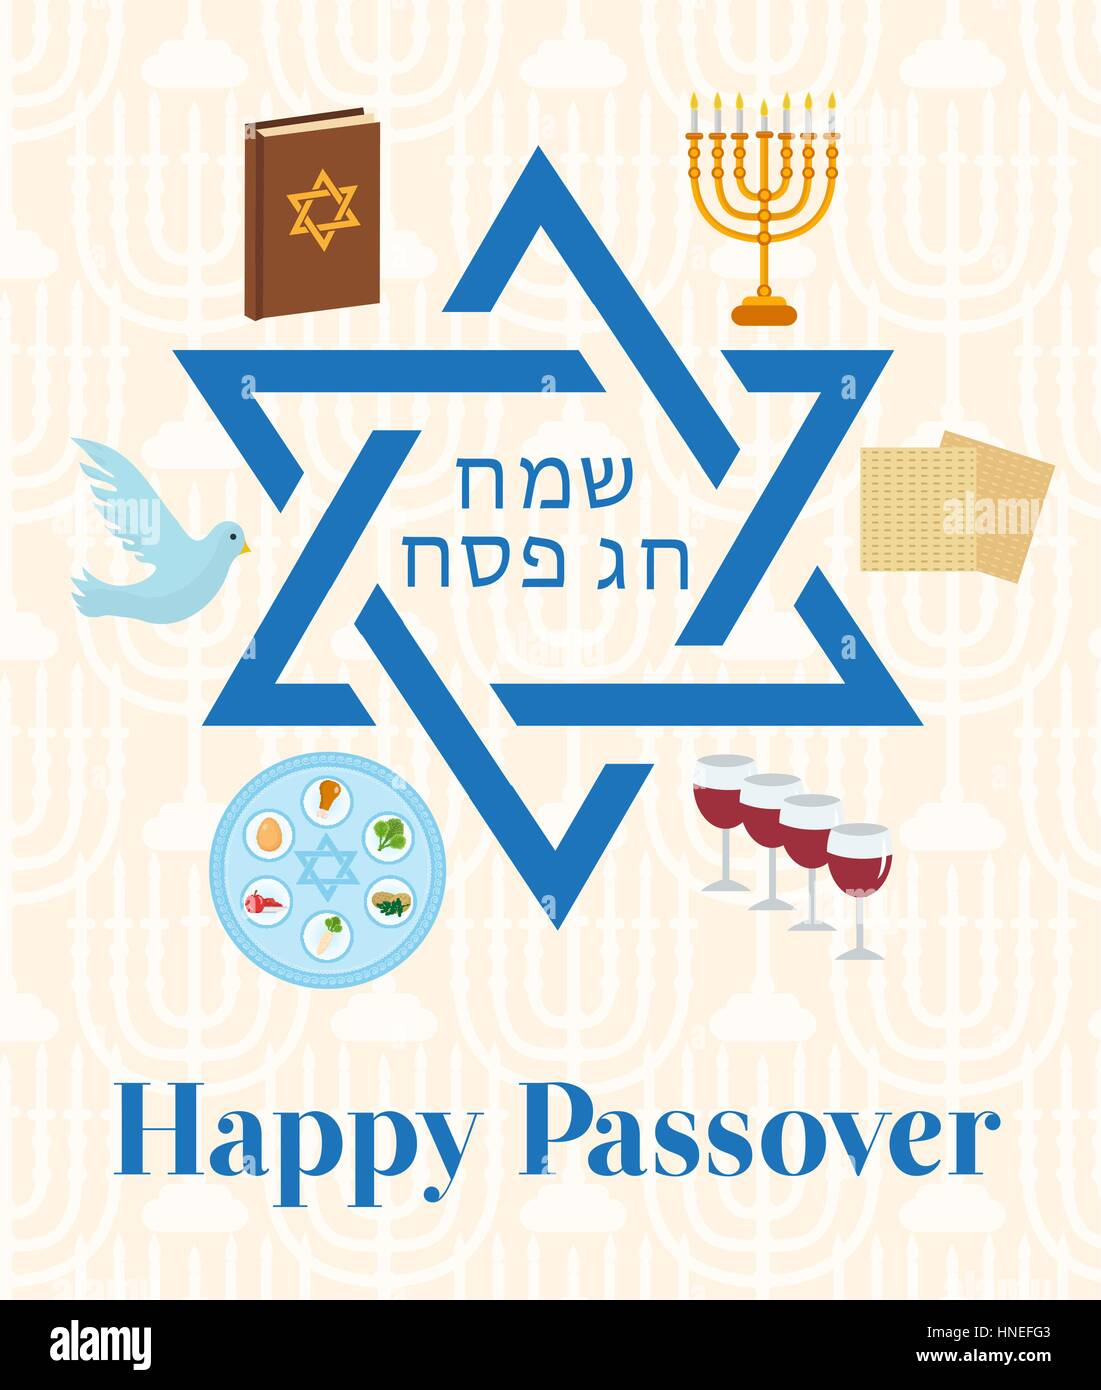 Happy Passover greeting card with torus, menorah, wine, matzoh, seder. Holiday Jewish exodus from Egypt. Pesach - Stock Image